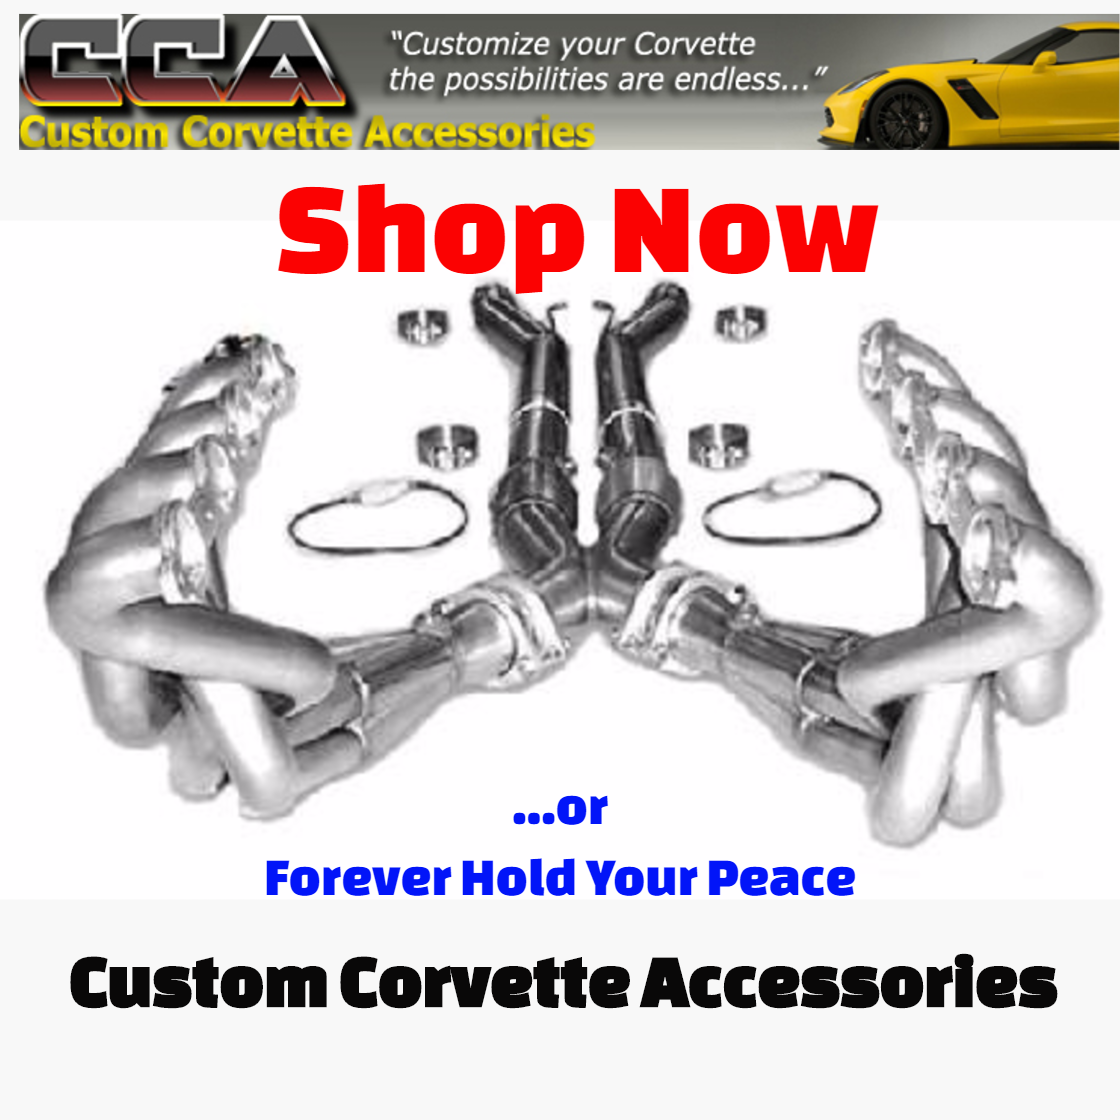 Custom Corvette Accessories Provides Aftermarket Corvette Parts And Accessories For The C7 Corvette Stingray G Corvette Accessories Corvette Corvette Stingray